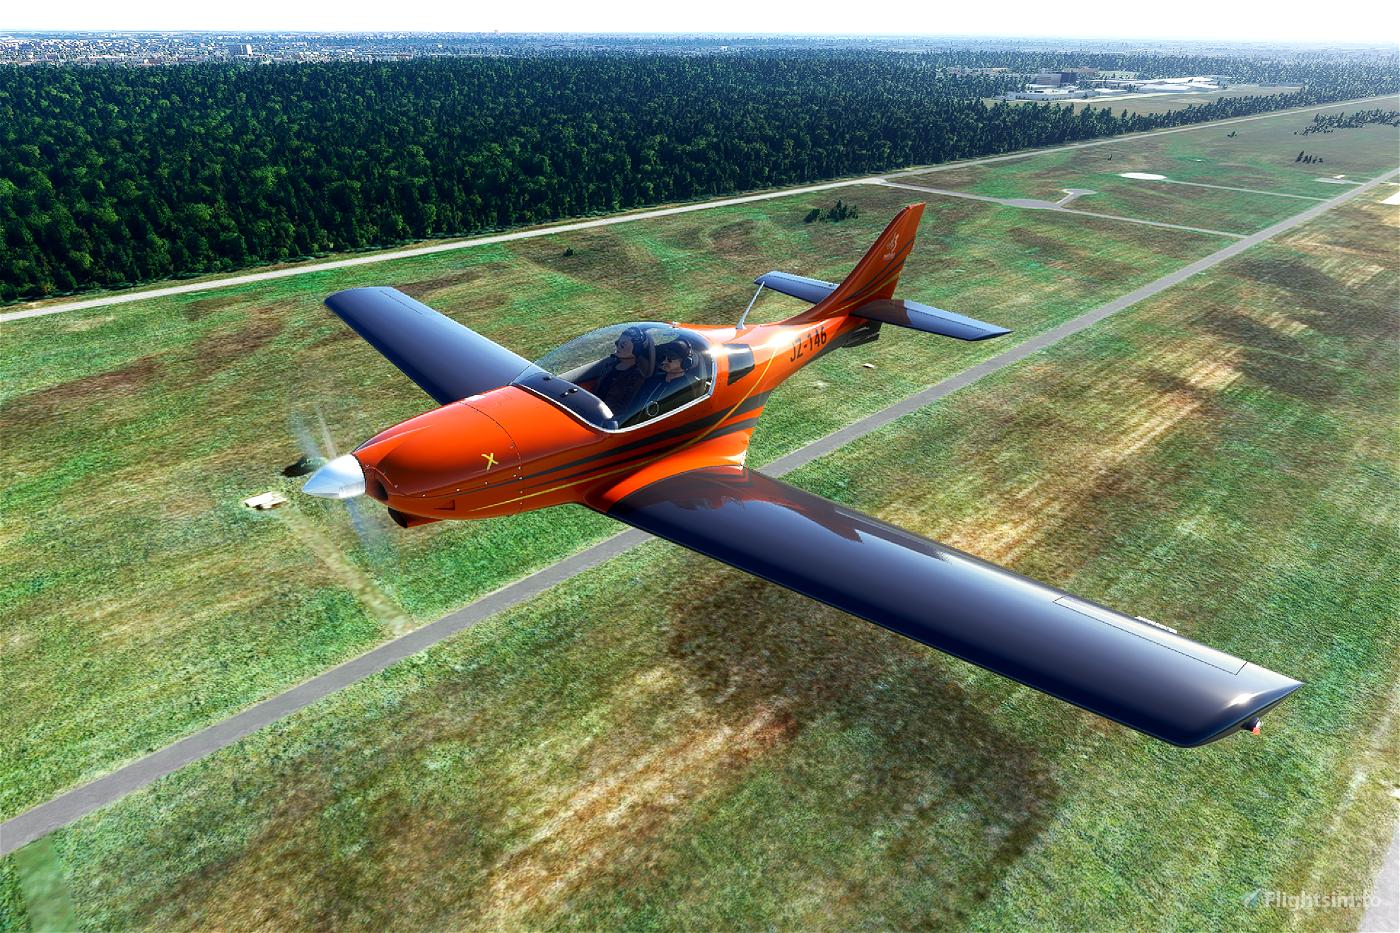 JMB VL3 X series (9 colours) Flight Simulator 2020